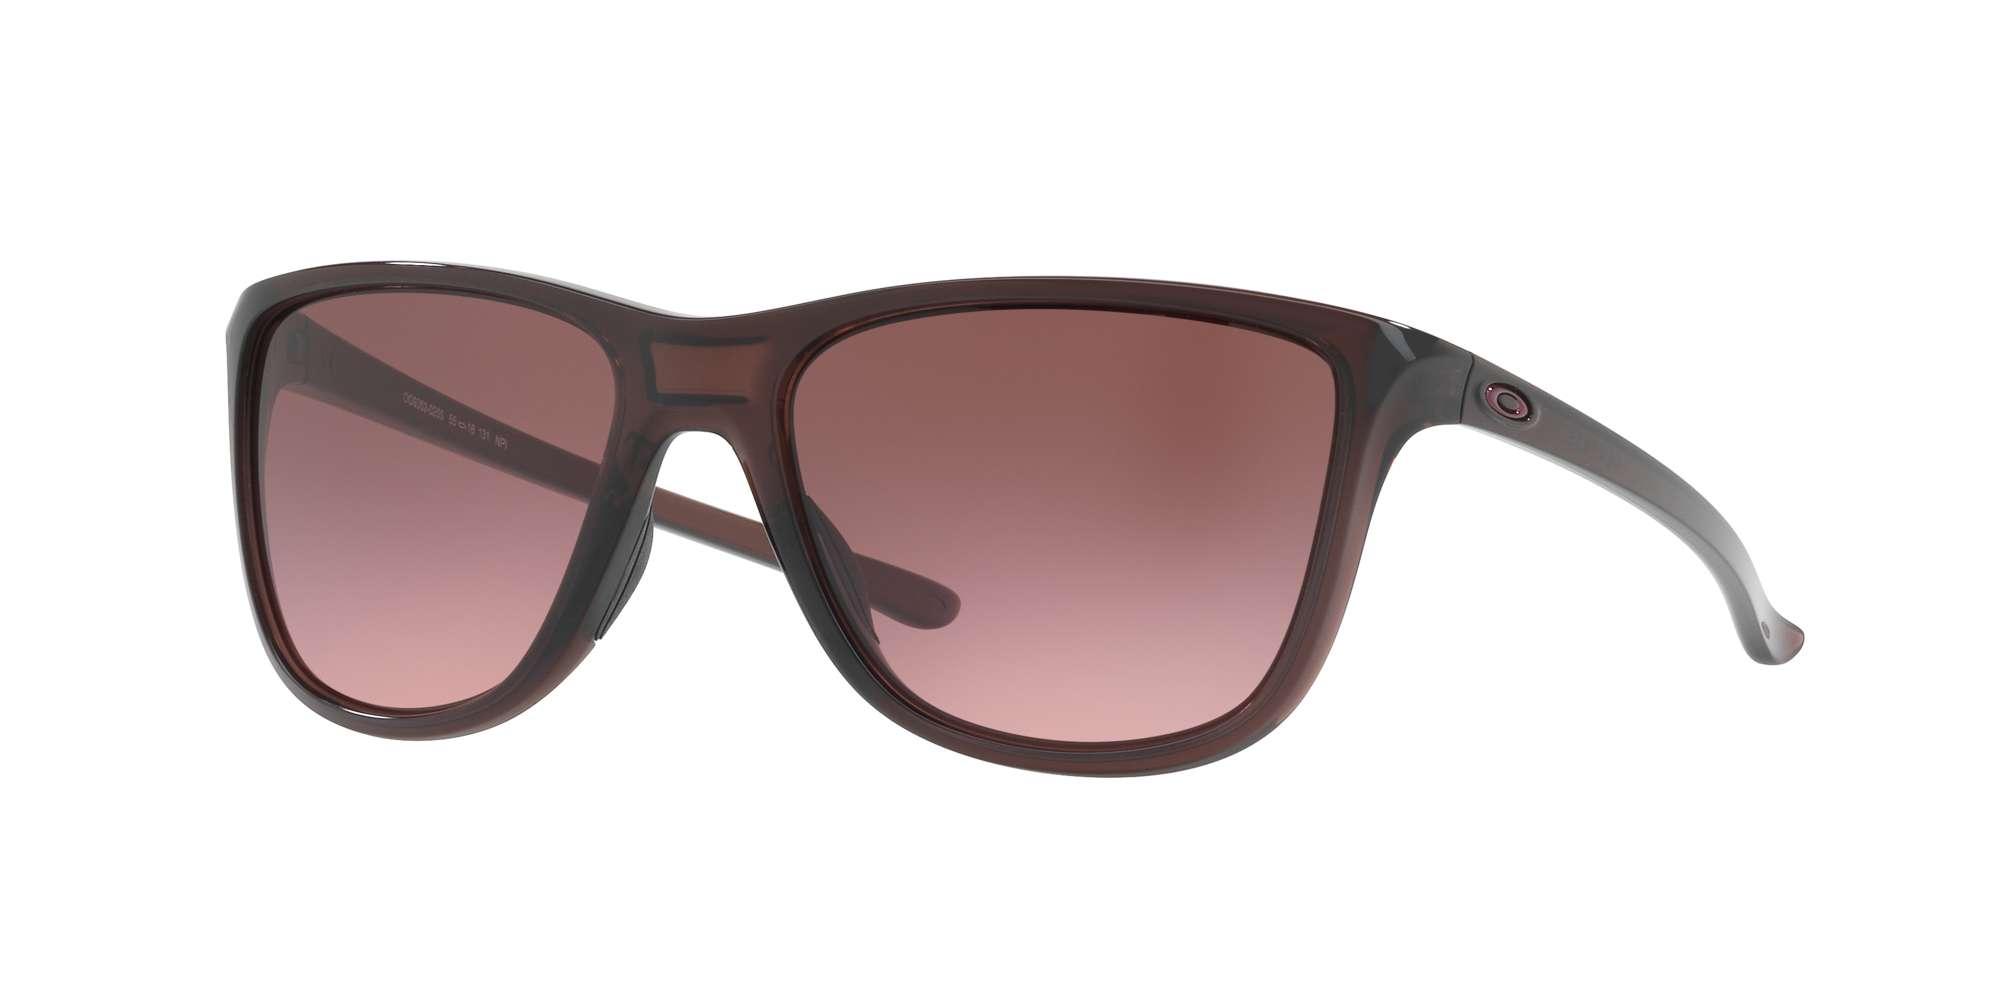 AMETHYST / G40 BLACK GRADIENT lenses